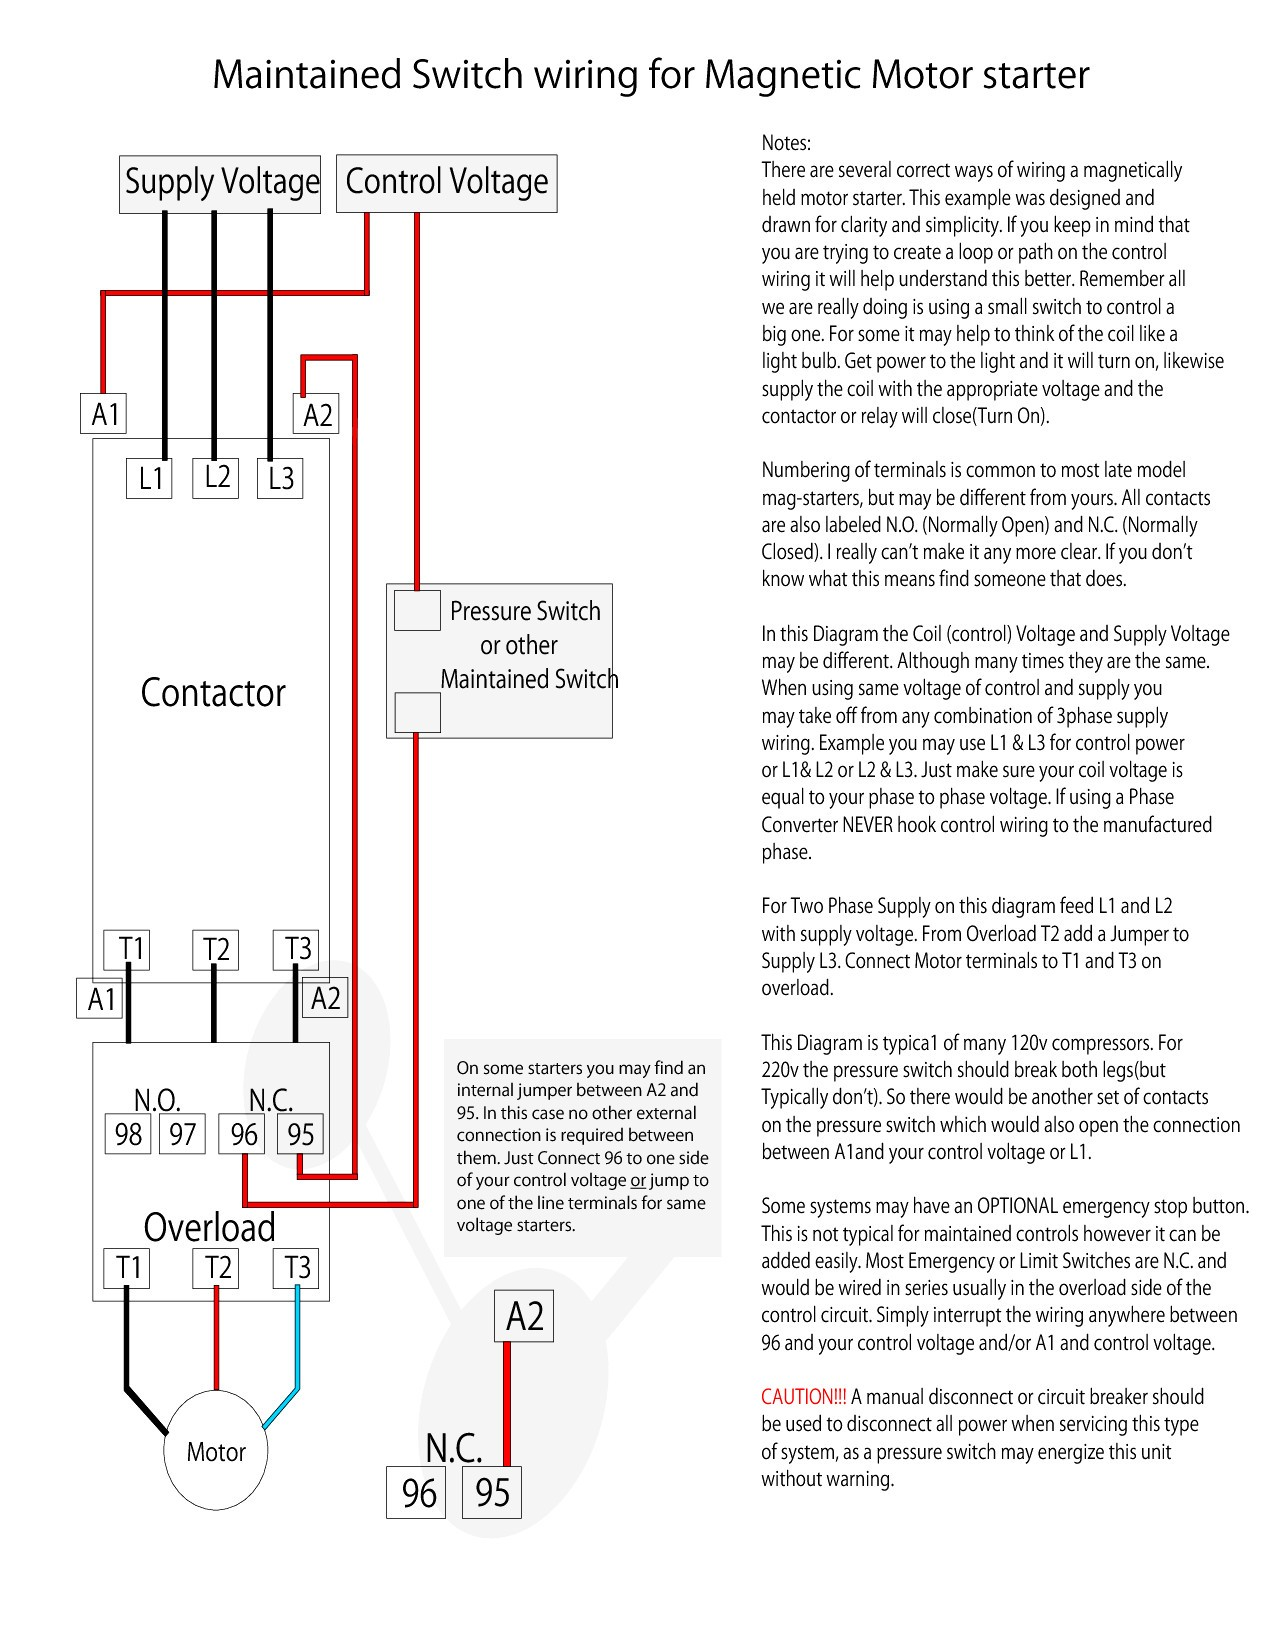 Cutler Hammer Starter Wiring Diagram Simplified Shapes Cutler Hammer Starter Wiring Diagram Elegant 3tf5222 0d Contactors